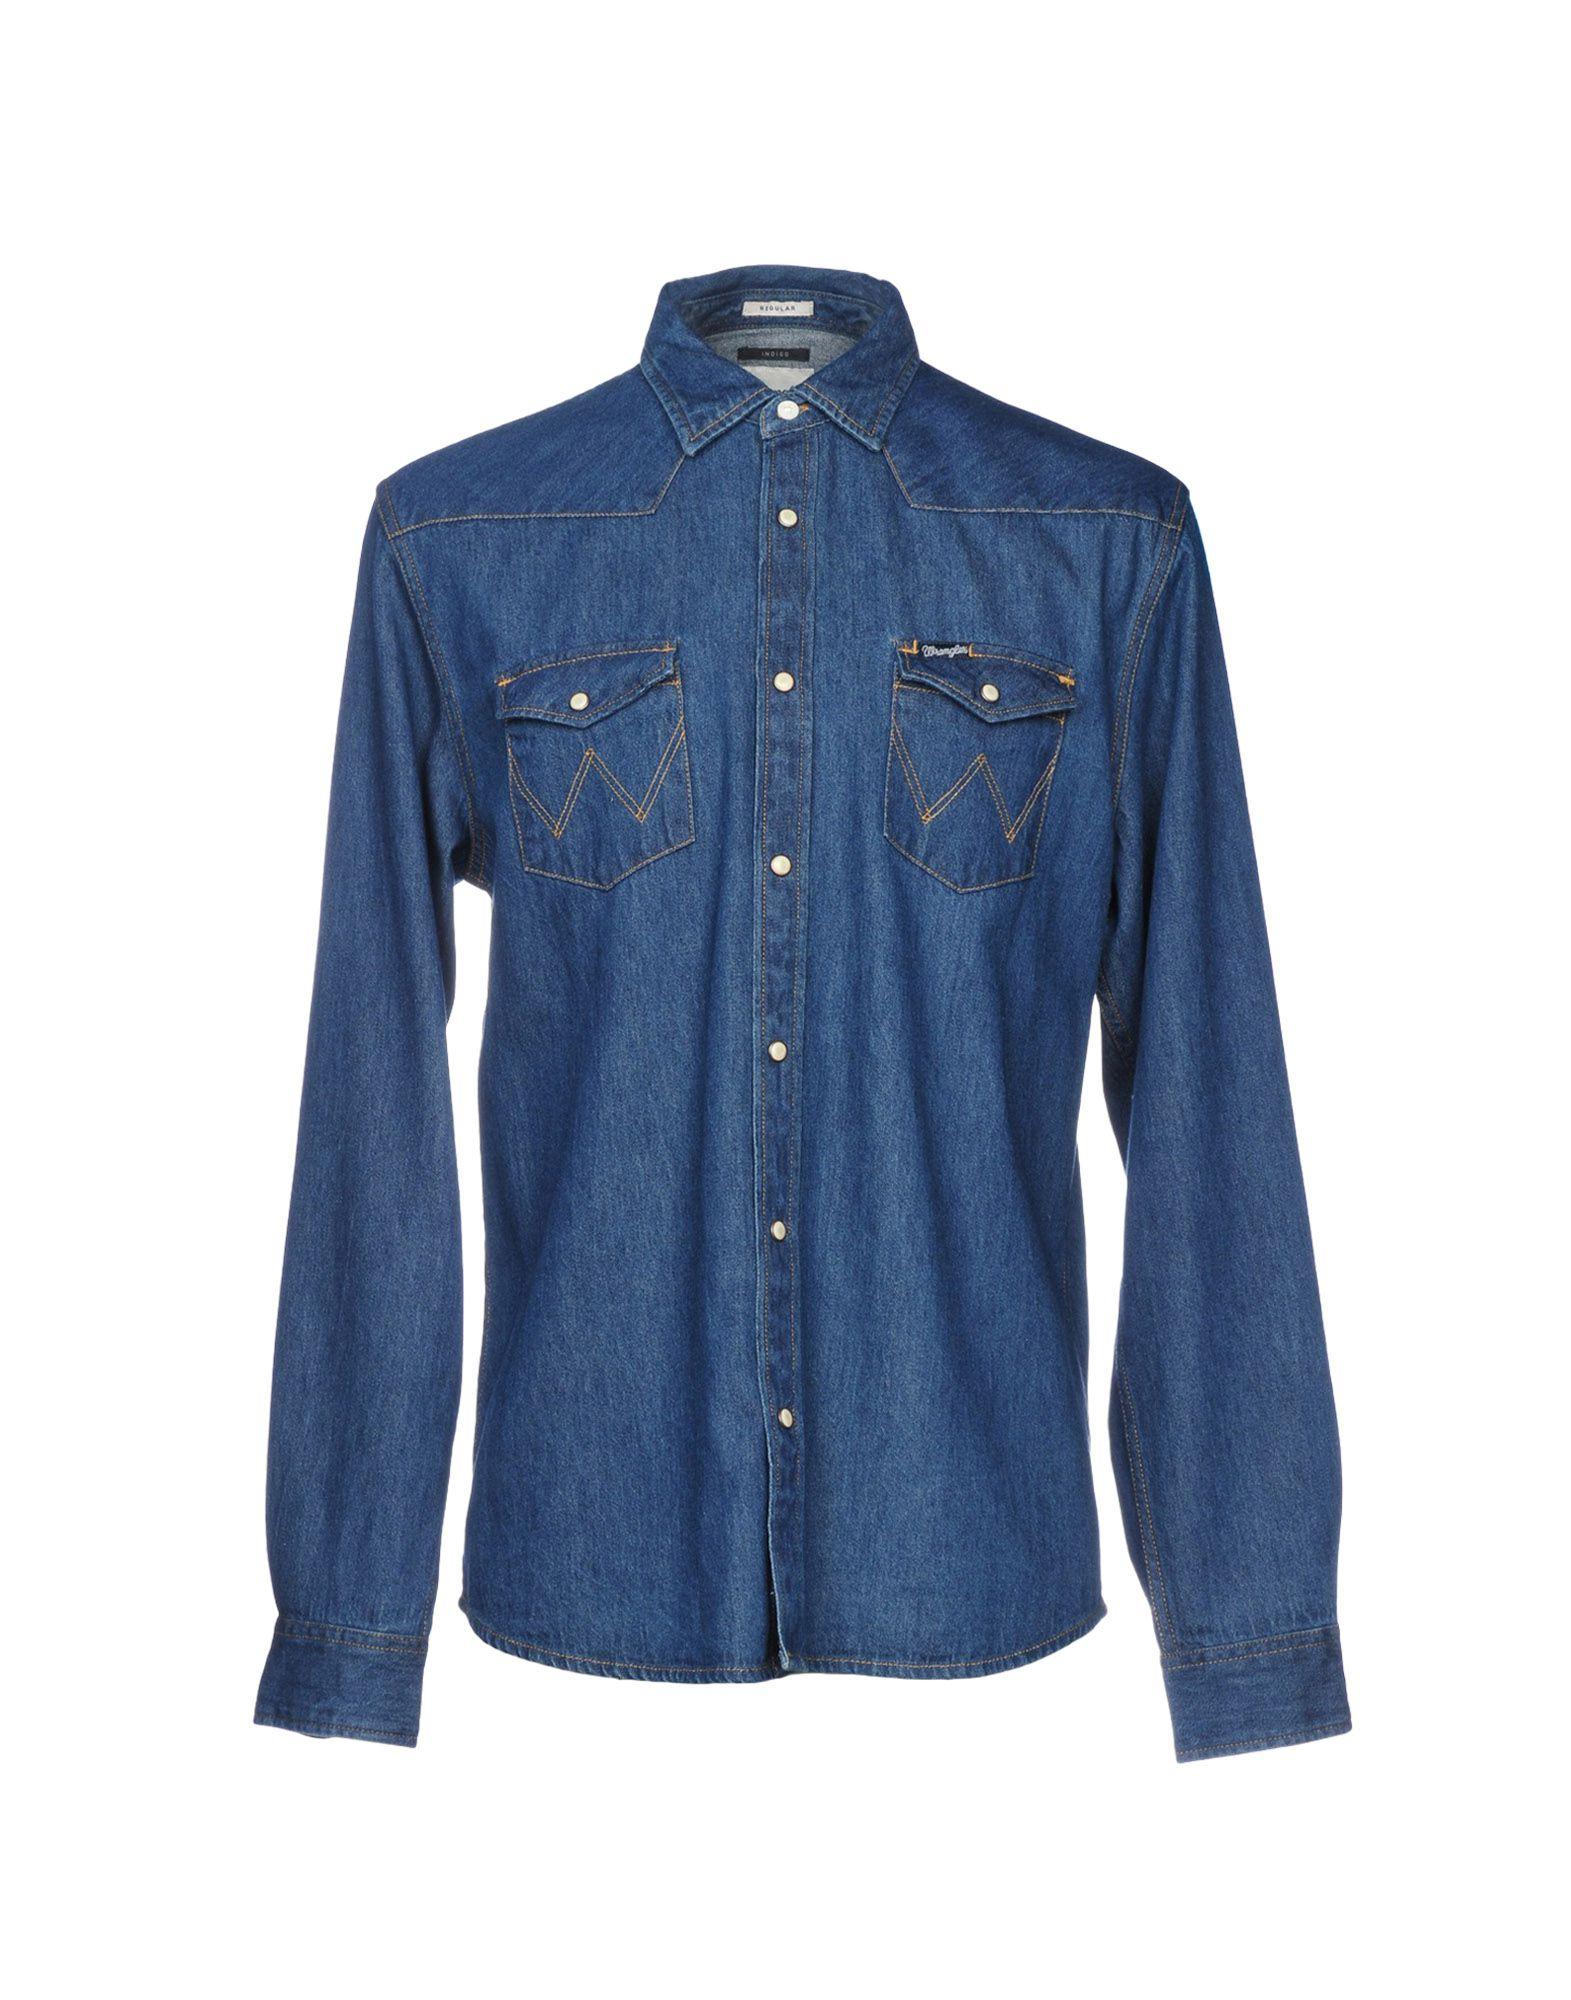 WRANGLER Джинсовая рубашка